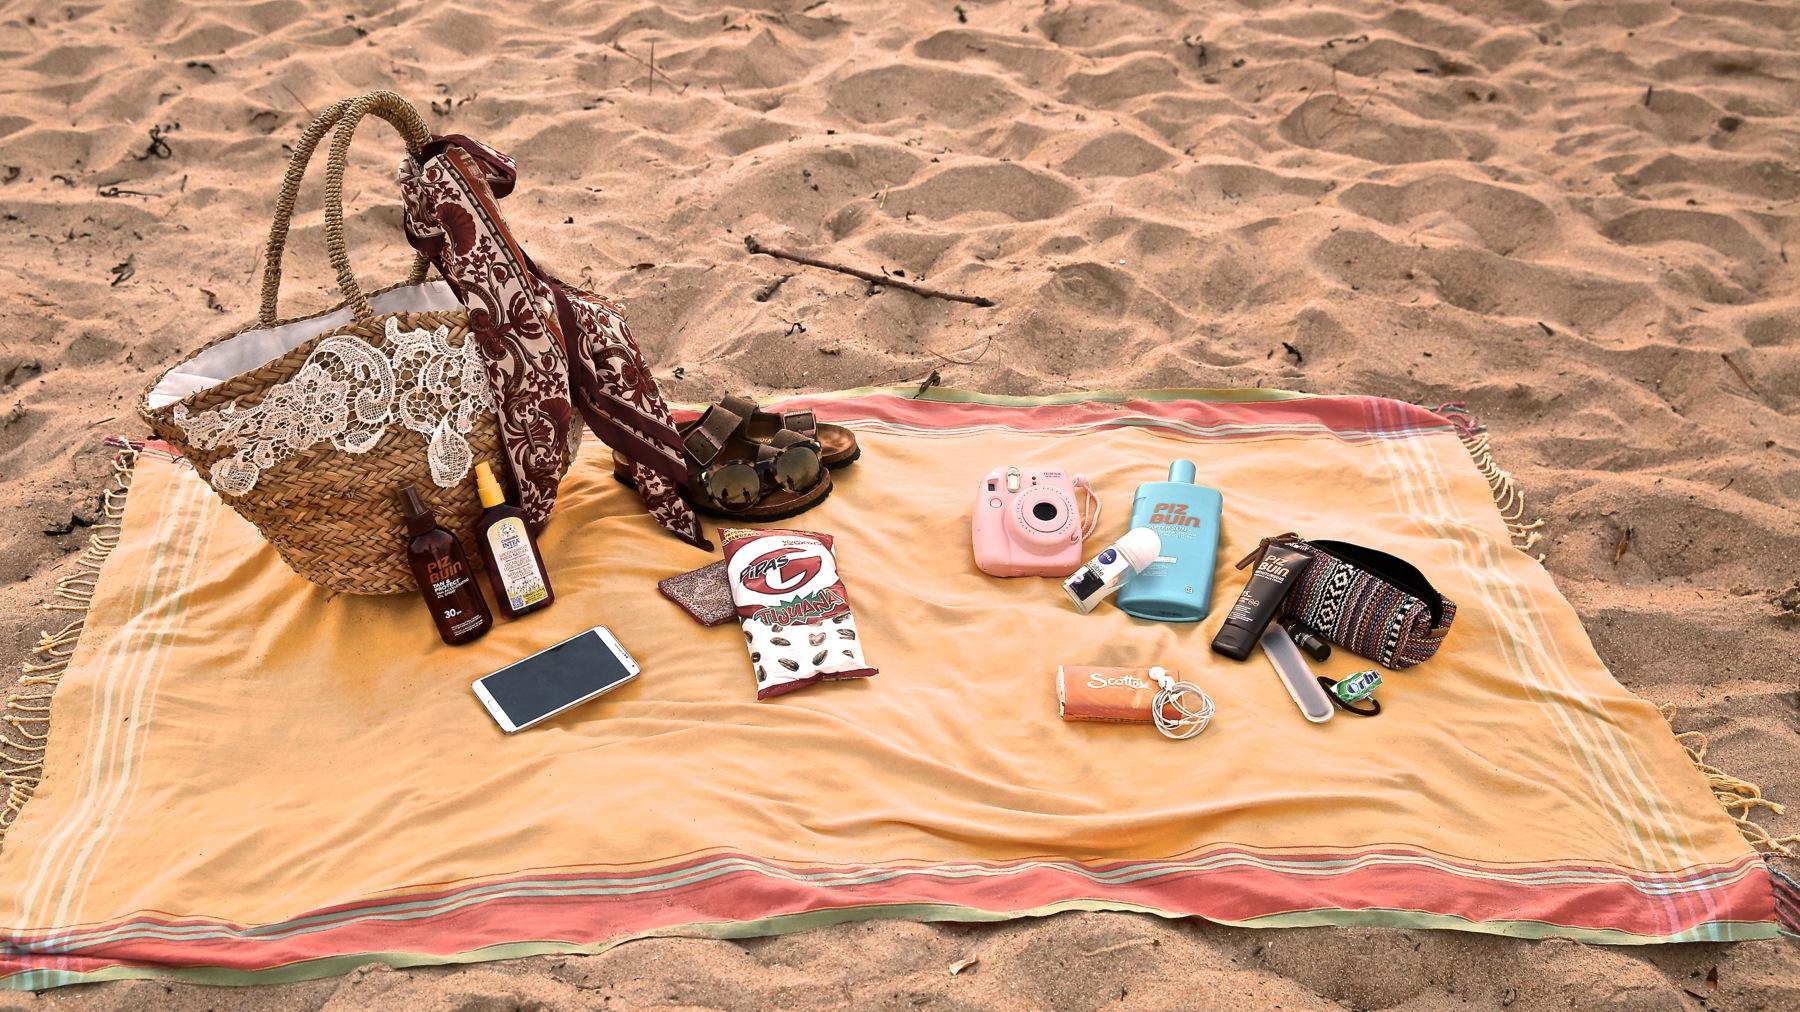 trendy_taste-look-outfit-street_style-boho-ootd-blog-blogger-fashion_spain-moda_españa-verano-crochet-vestido-bikini-hippie-dress-galicia-sunset-puesta_de_sol-piz_buin-3